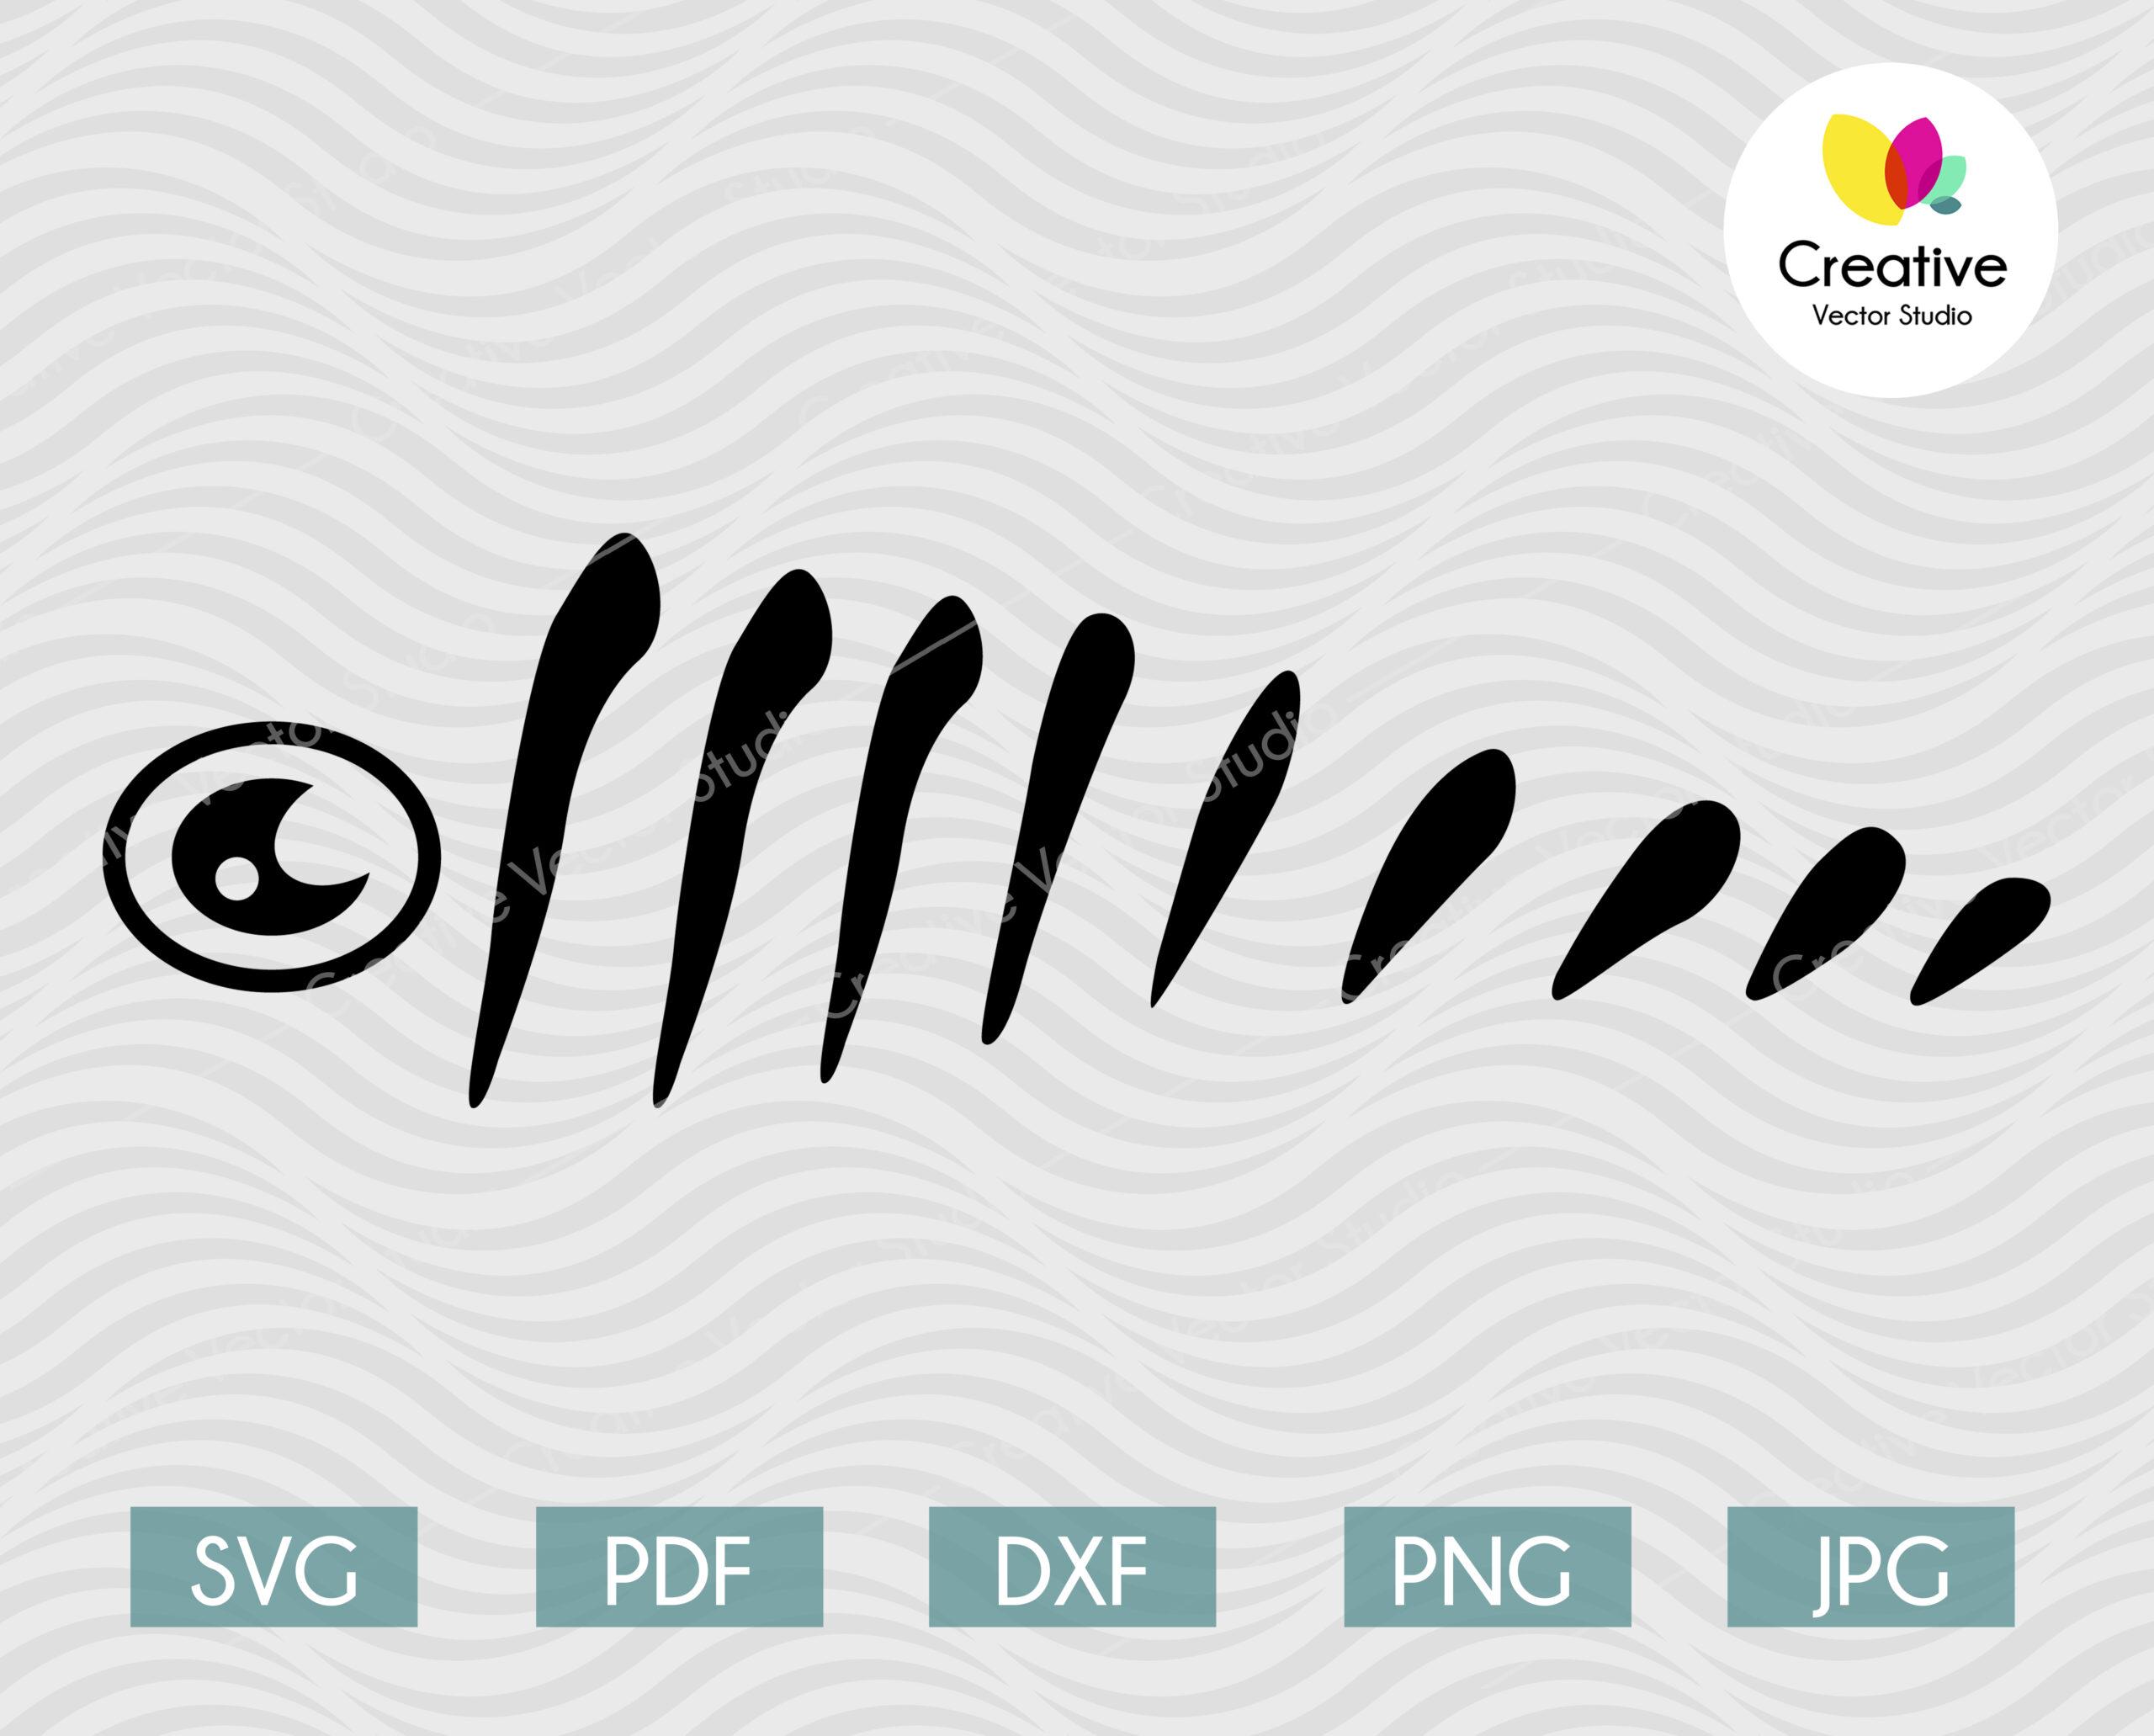 Download Fishing Lure Svg 34 Cut File Image Creative Vector Studio